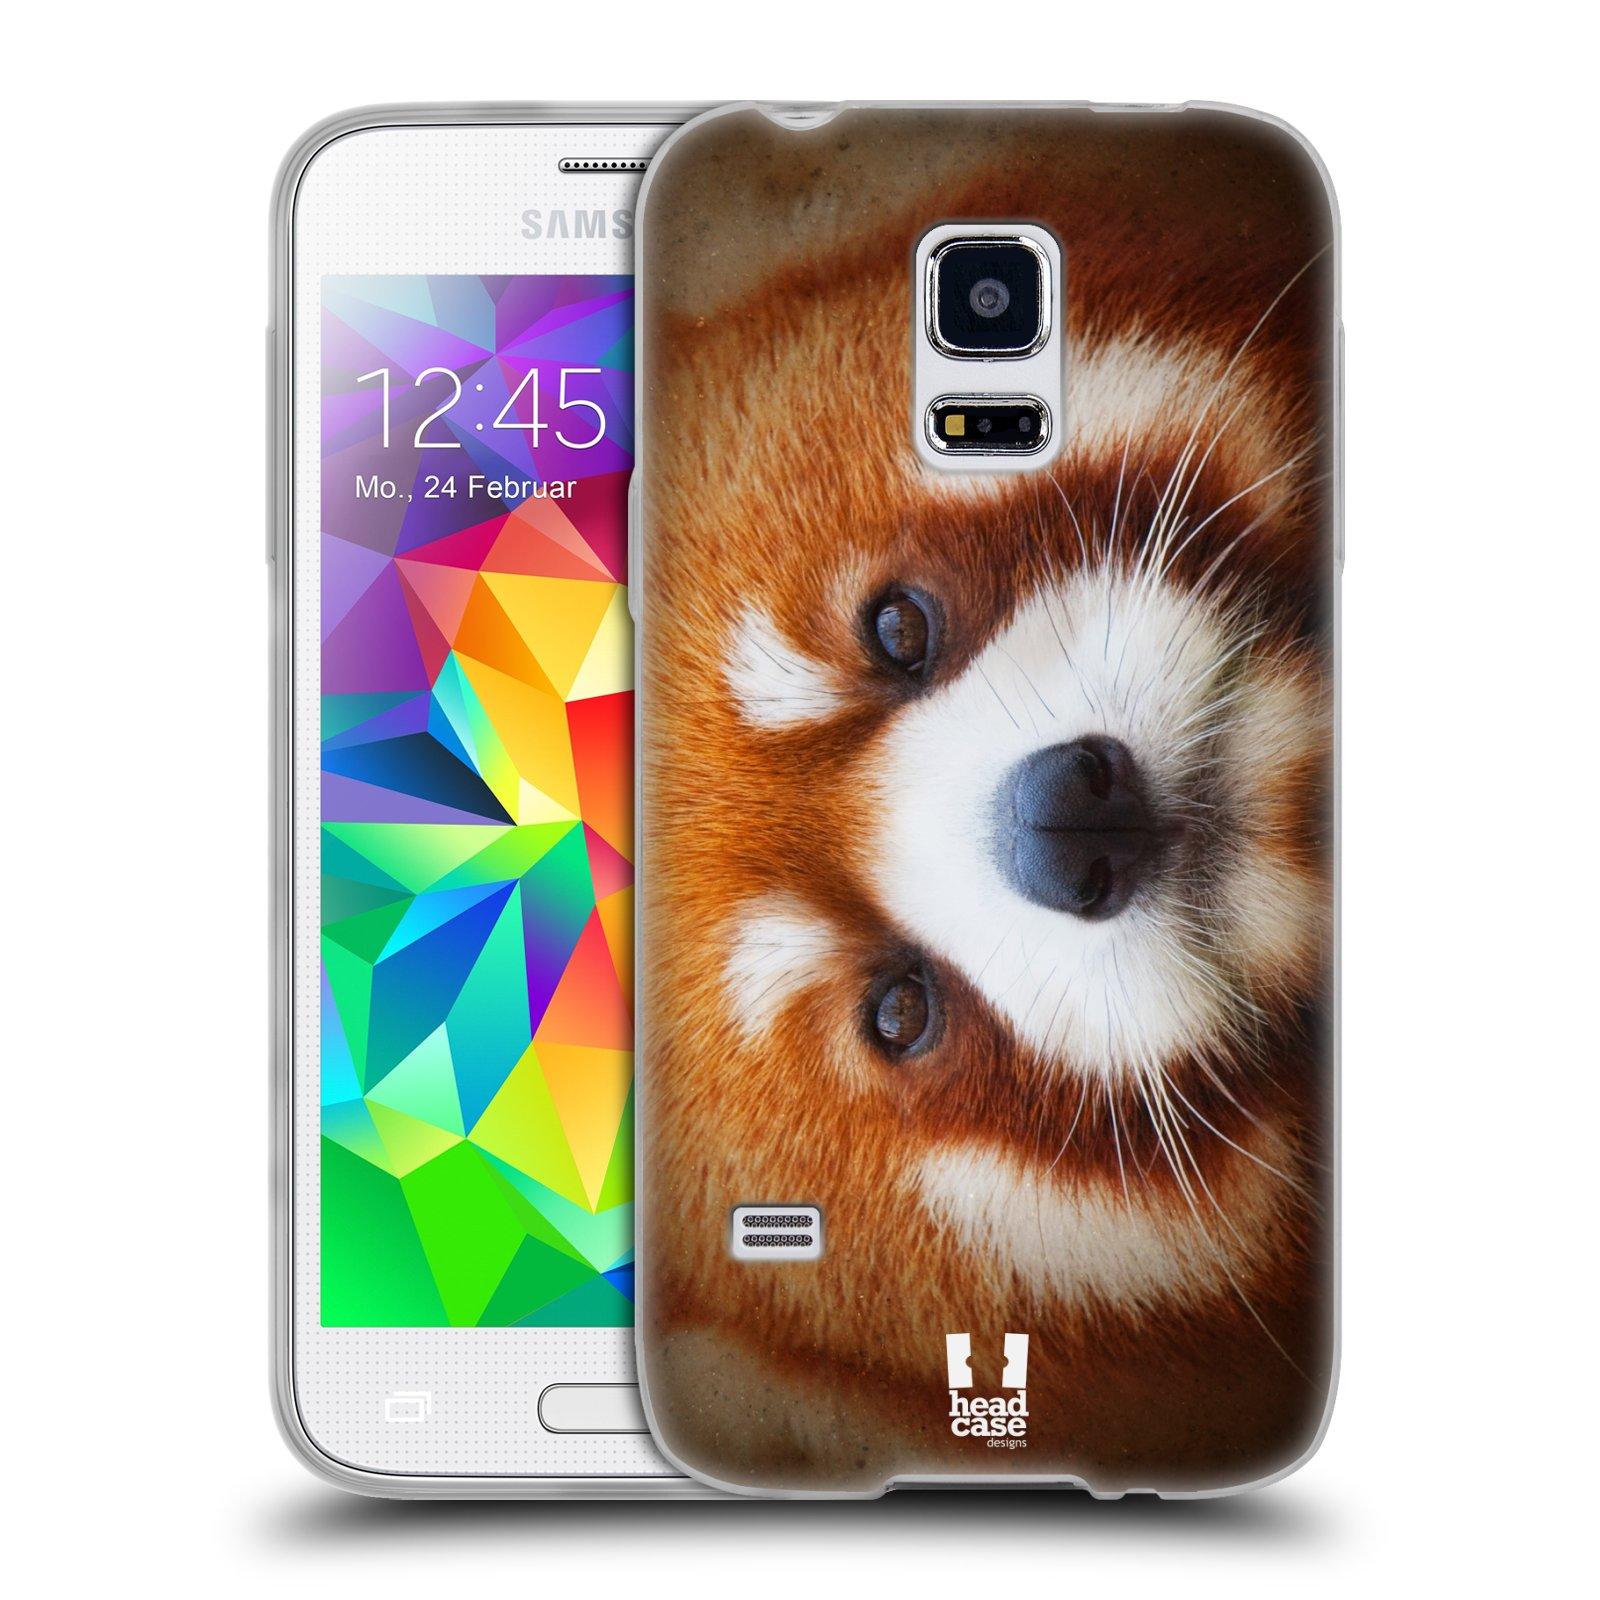 HEAD CASE silikonový obal na mobil Samsung Galaxy S5 MINI vzor Zvířecí tváře 2 medvěd panda rudá